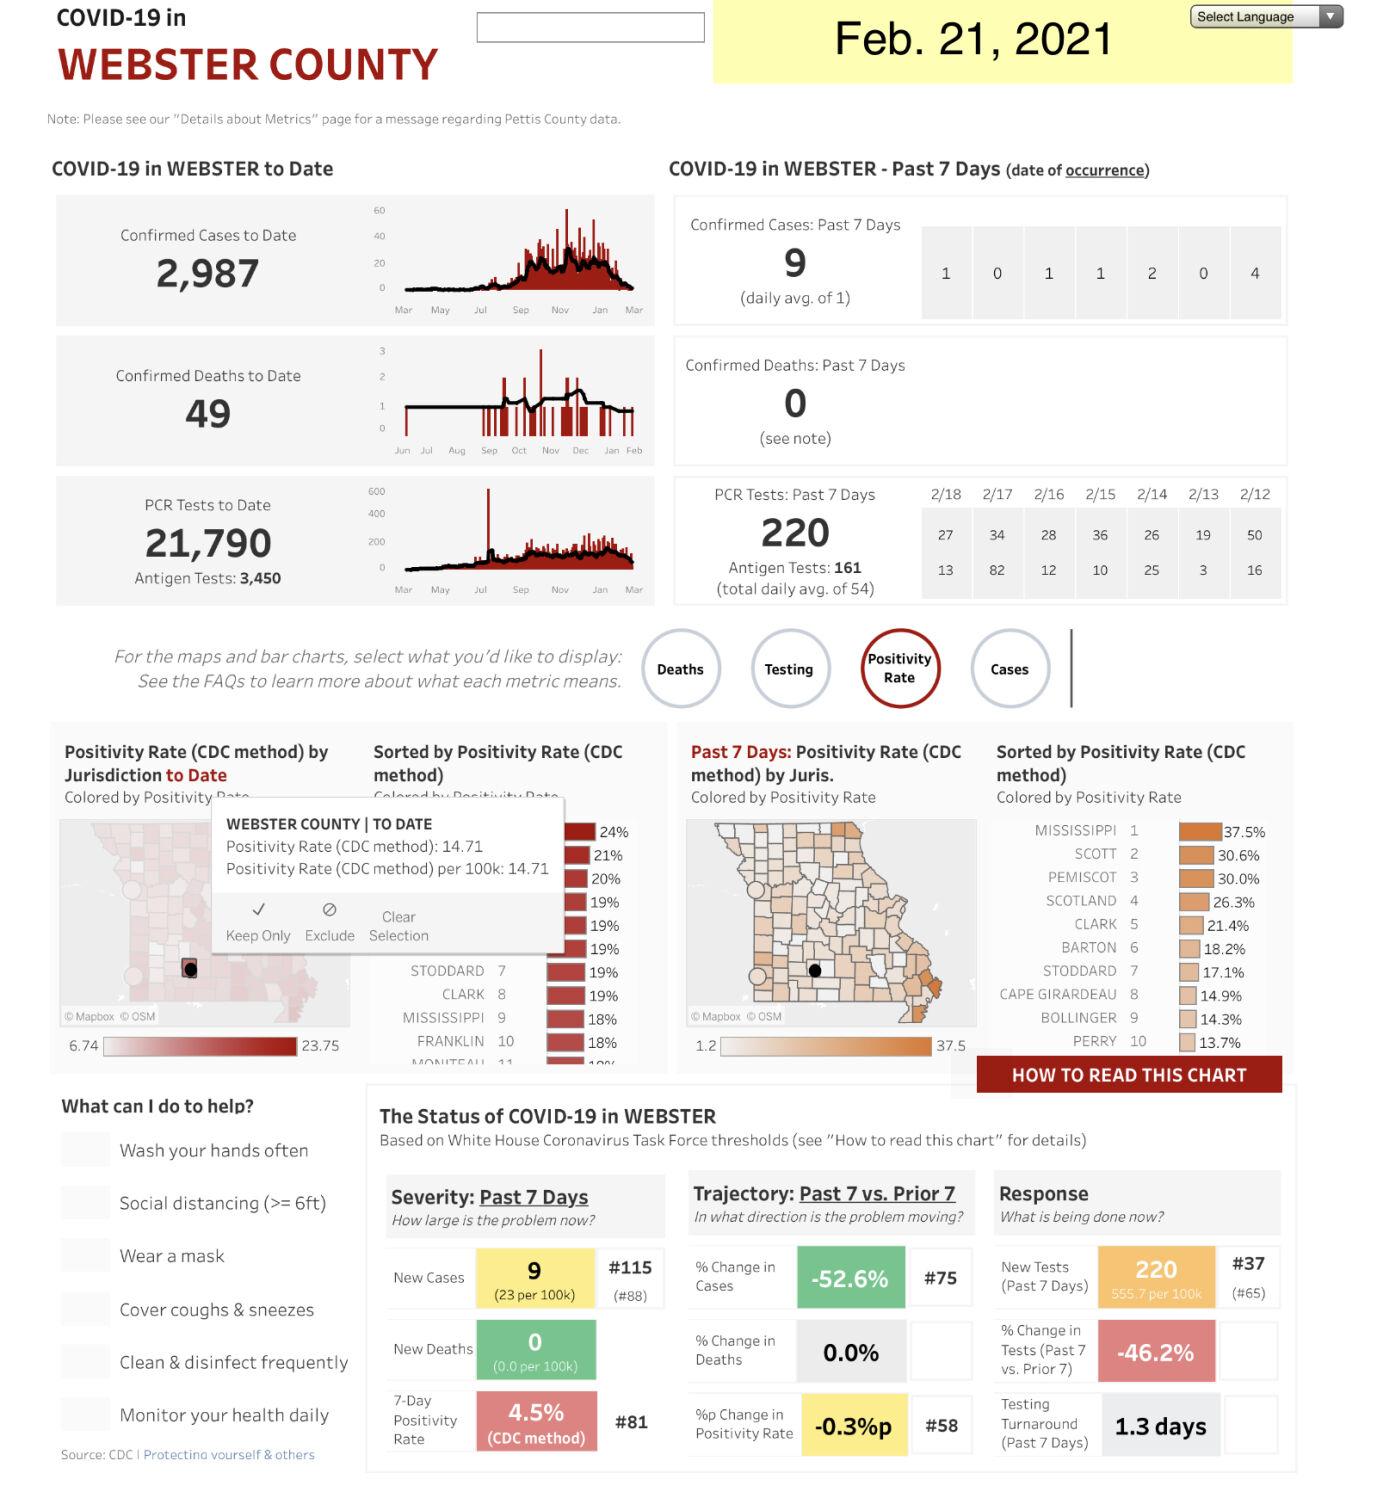 - COVID-19 cases Feb. 21, Web. Co. Mo. State